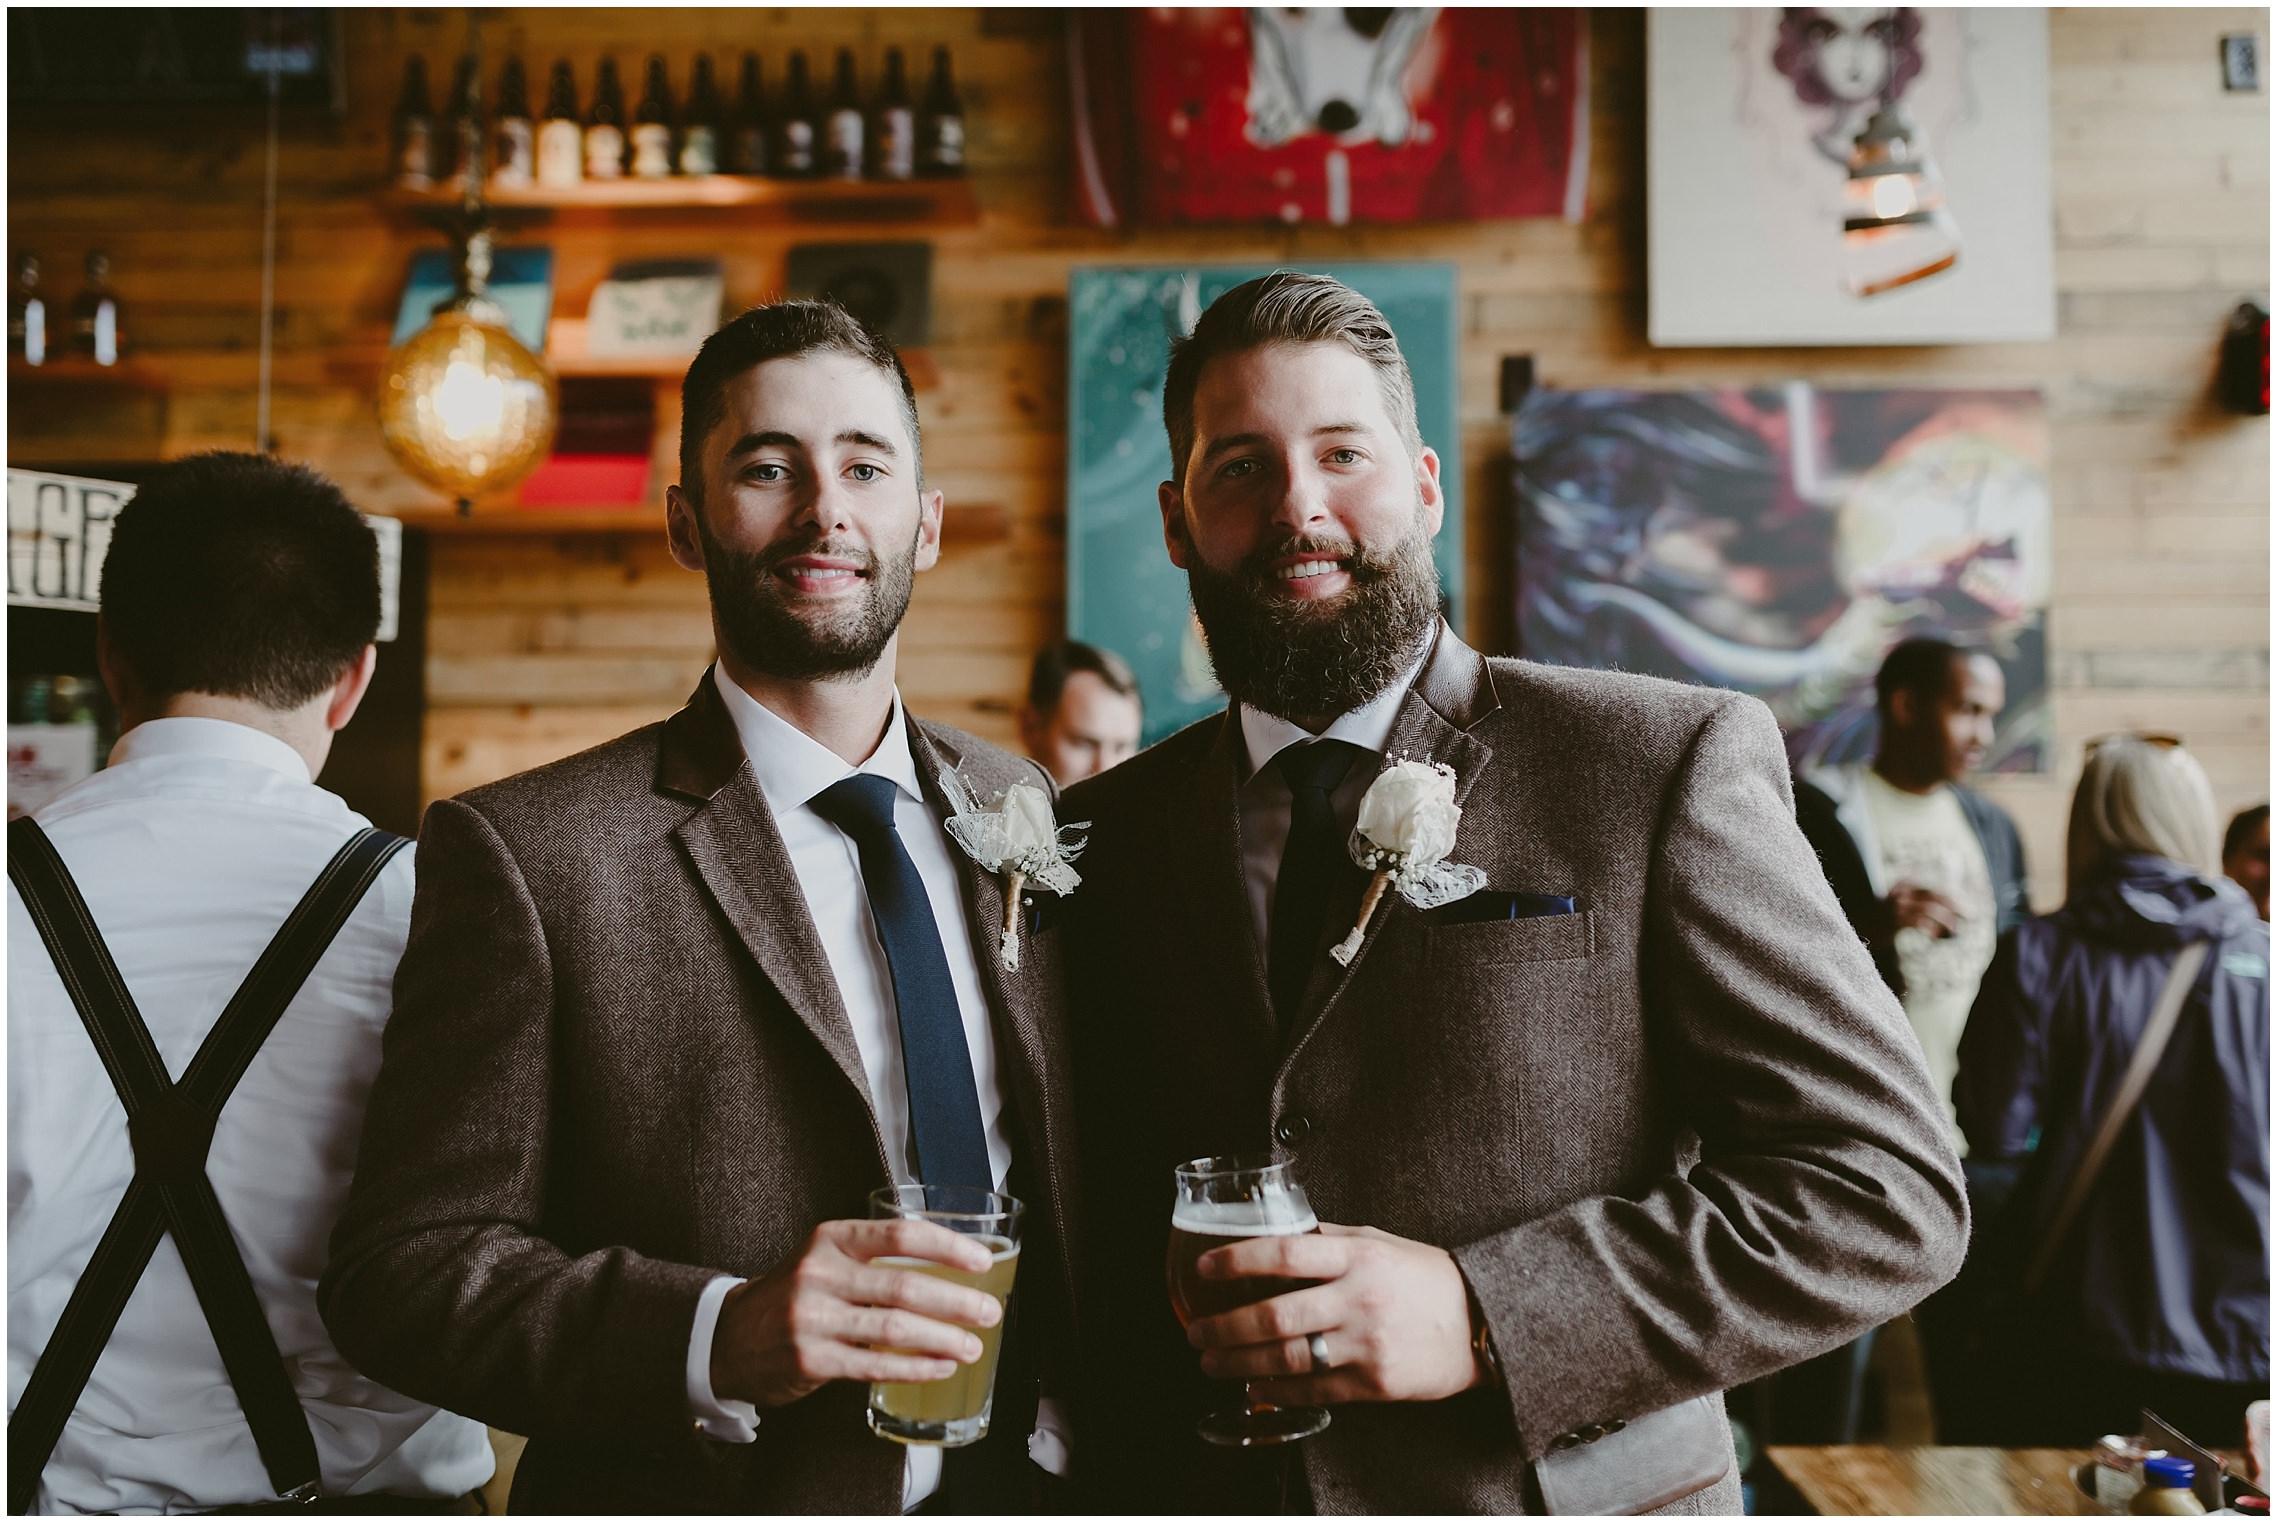 brick_and_mortar_colorado_wedding_photographer_0248.jpg